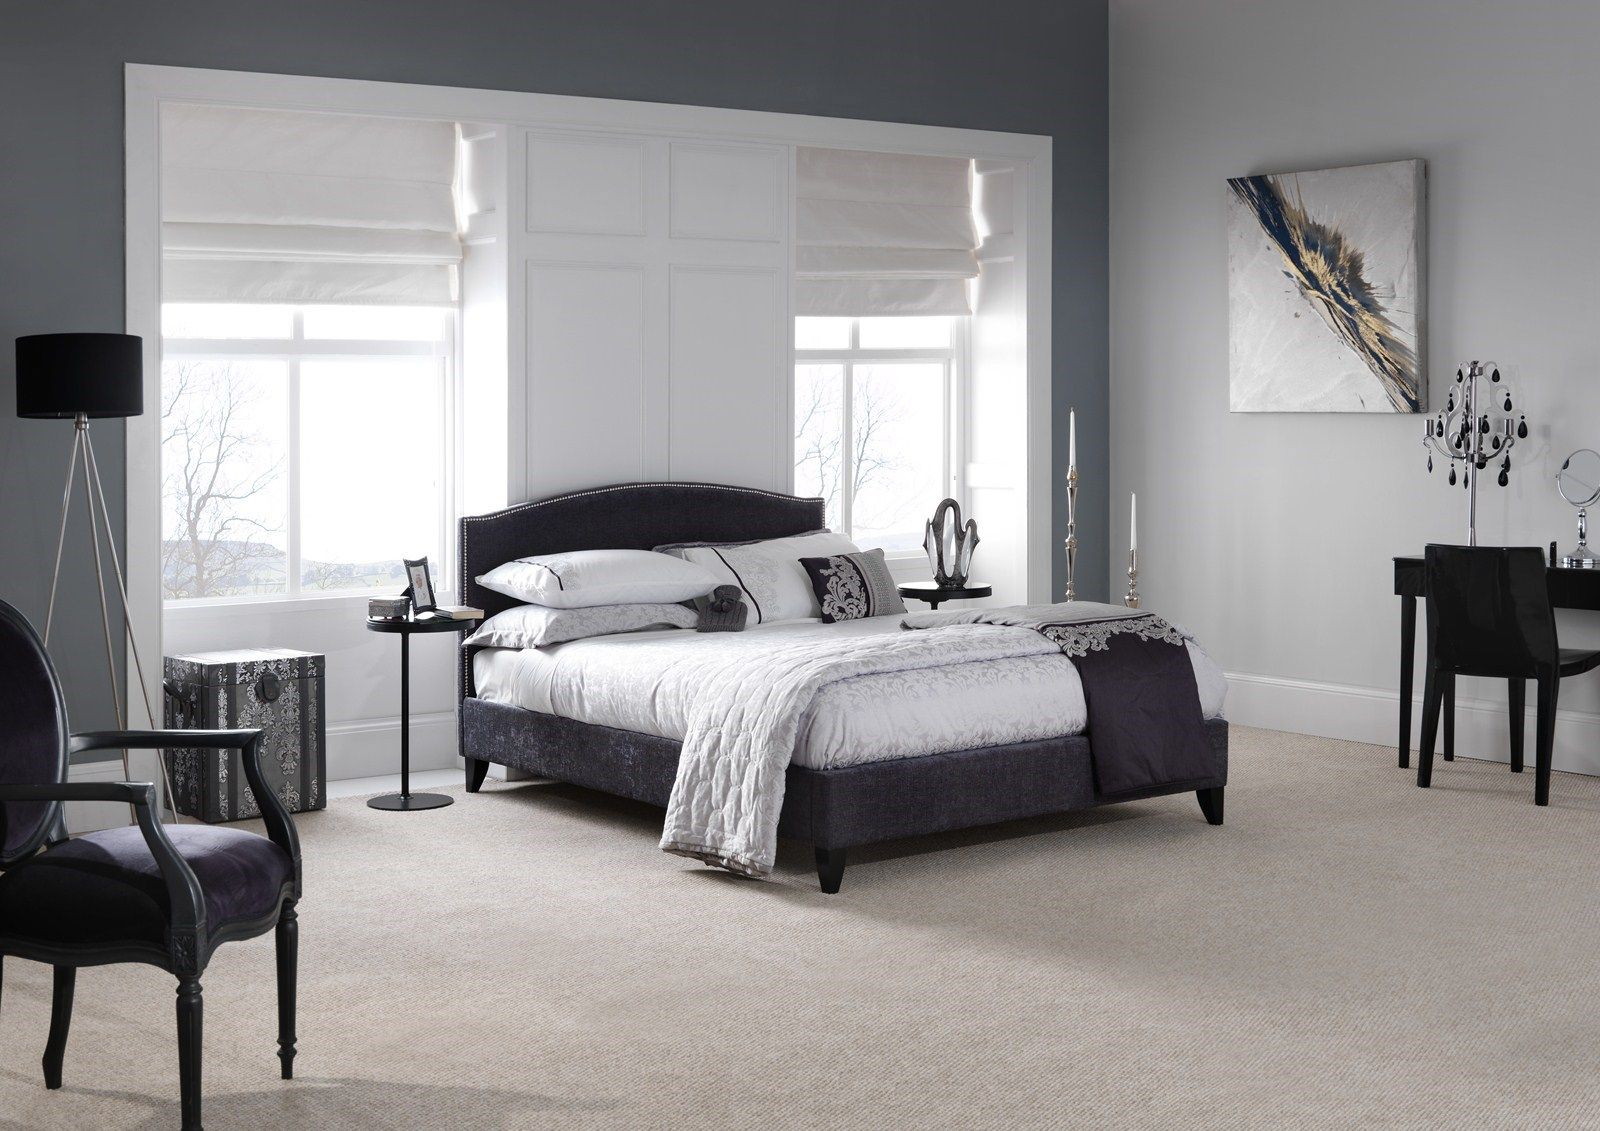 Bedroom Breathtaking Bedroom Design Ideas With King Sized Dark